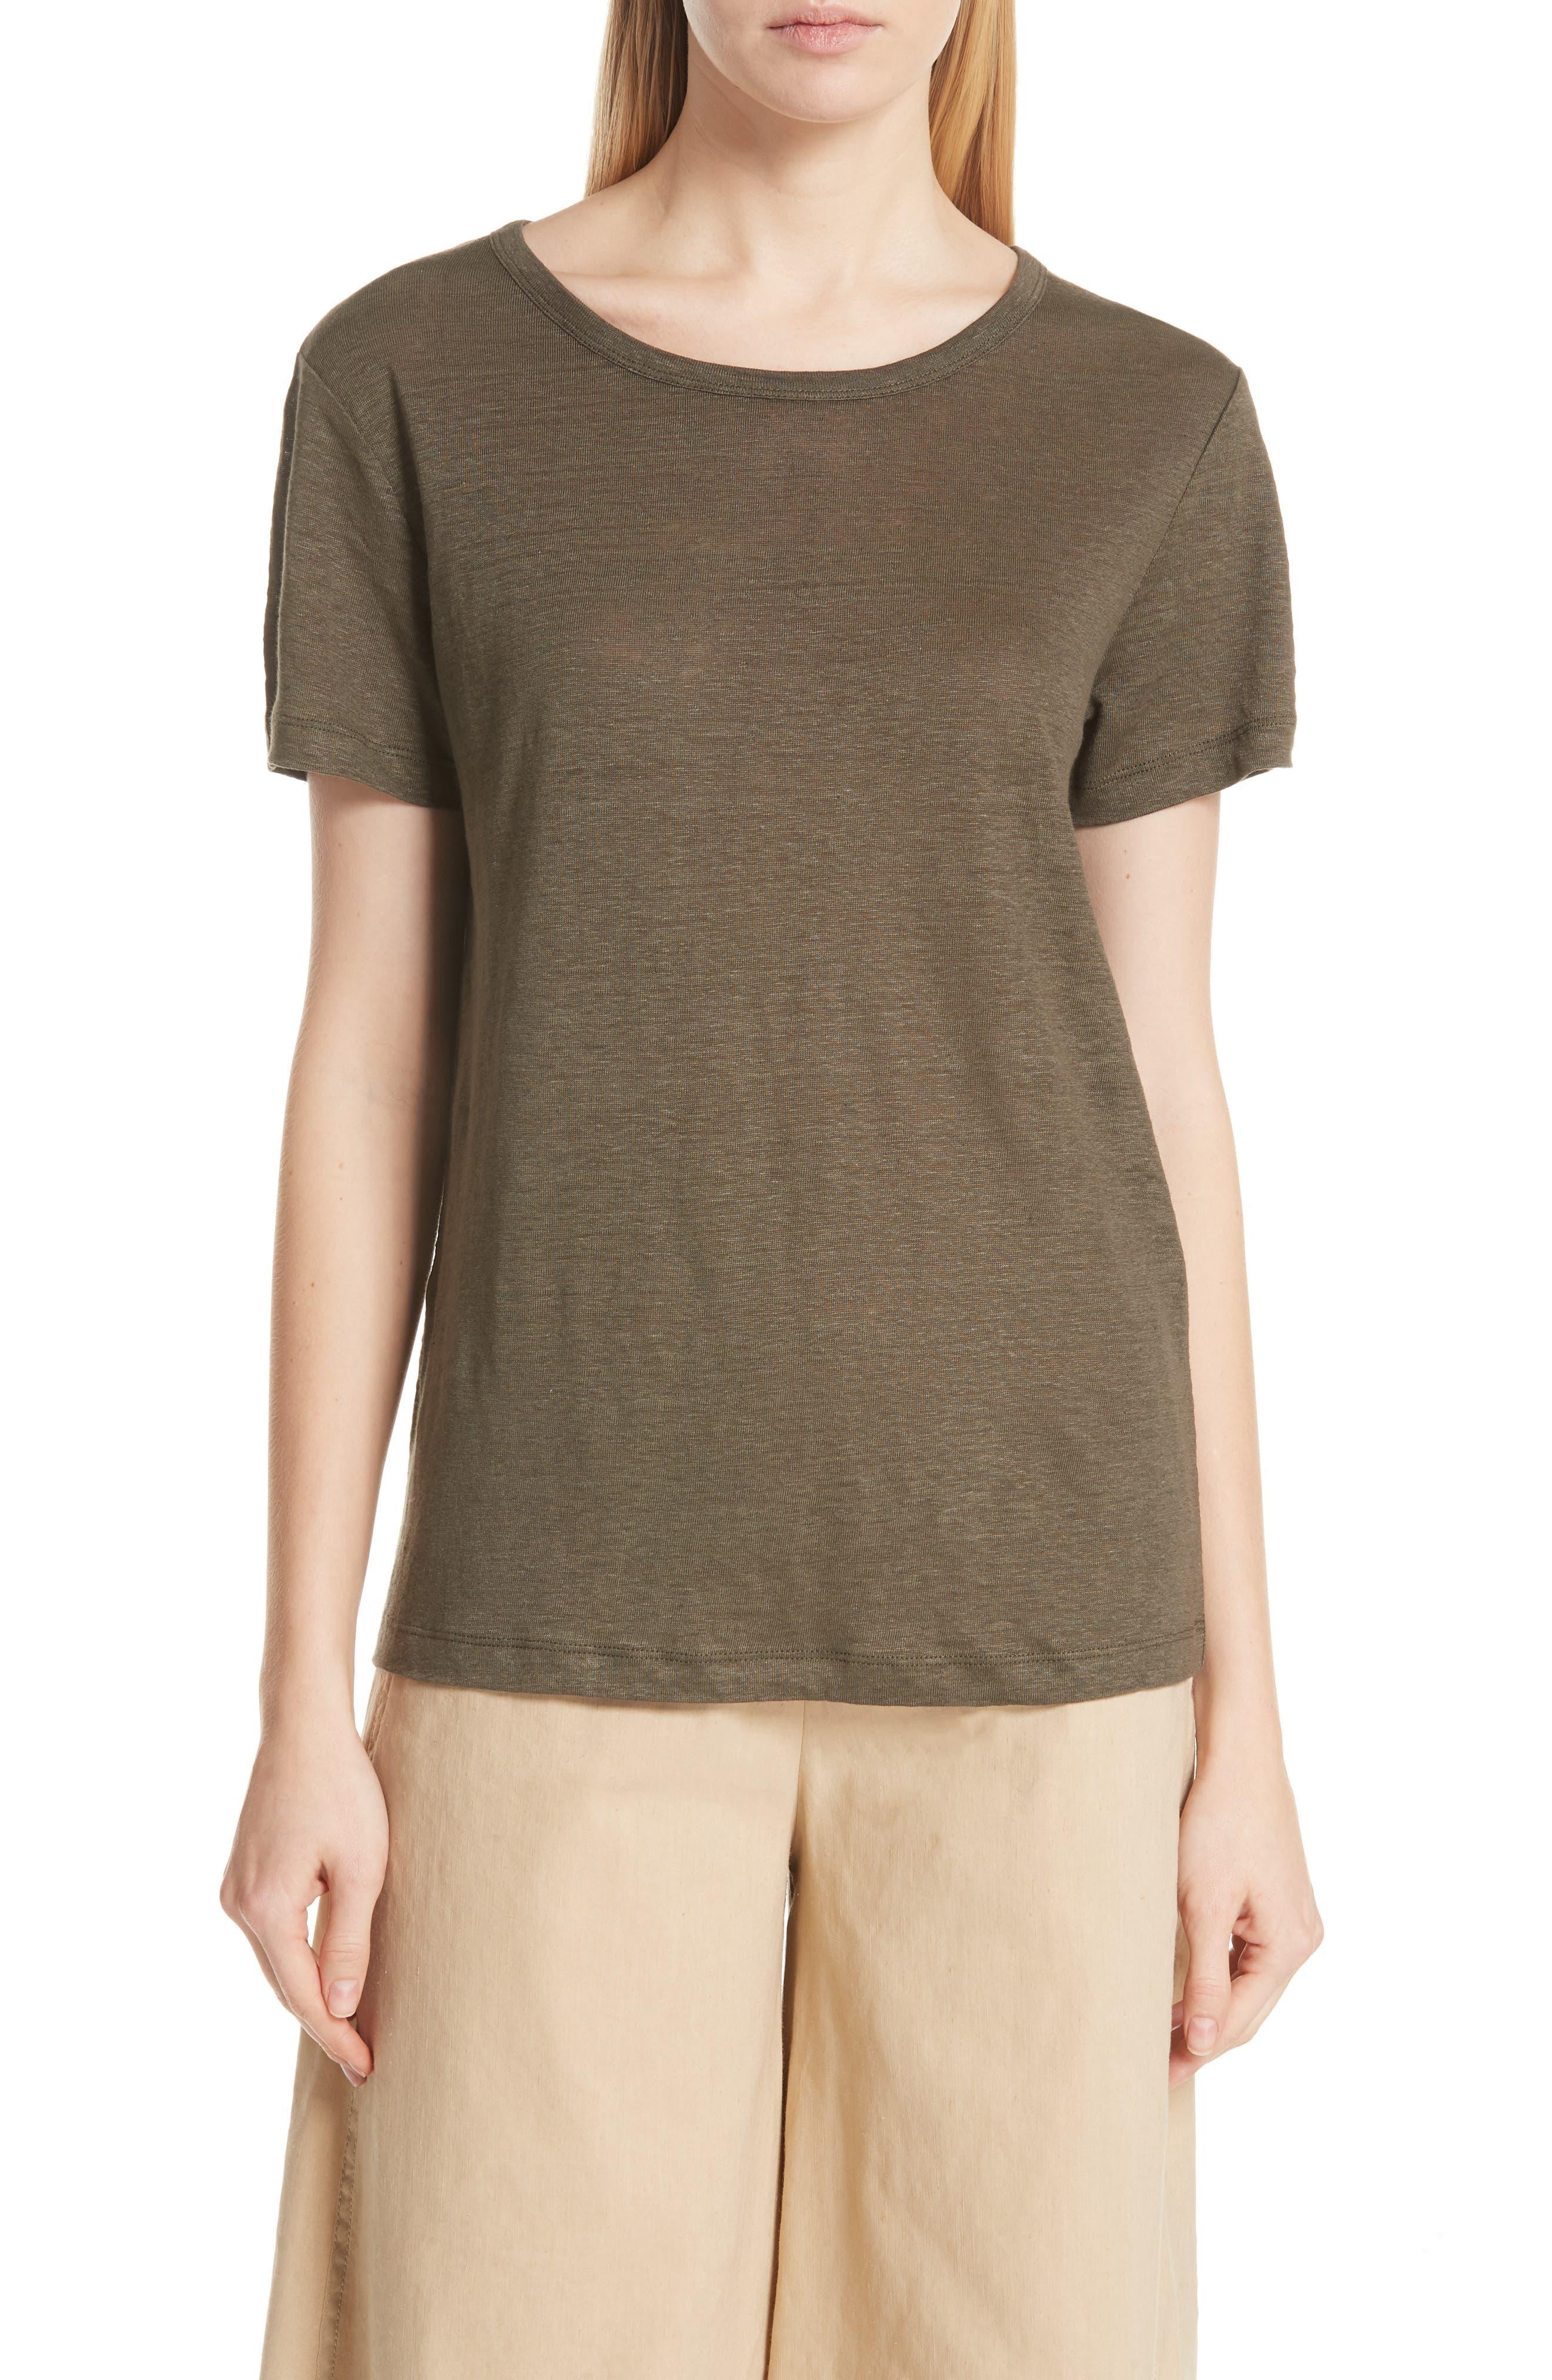 Alternate Image 1 Selected - Vince Linen Short Sleeve Top